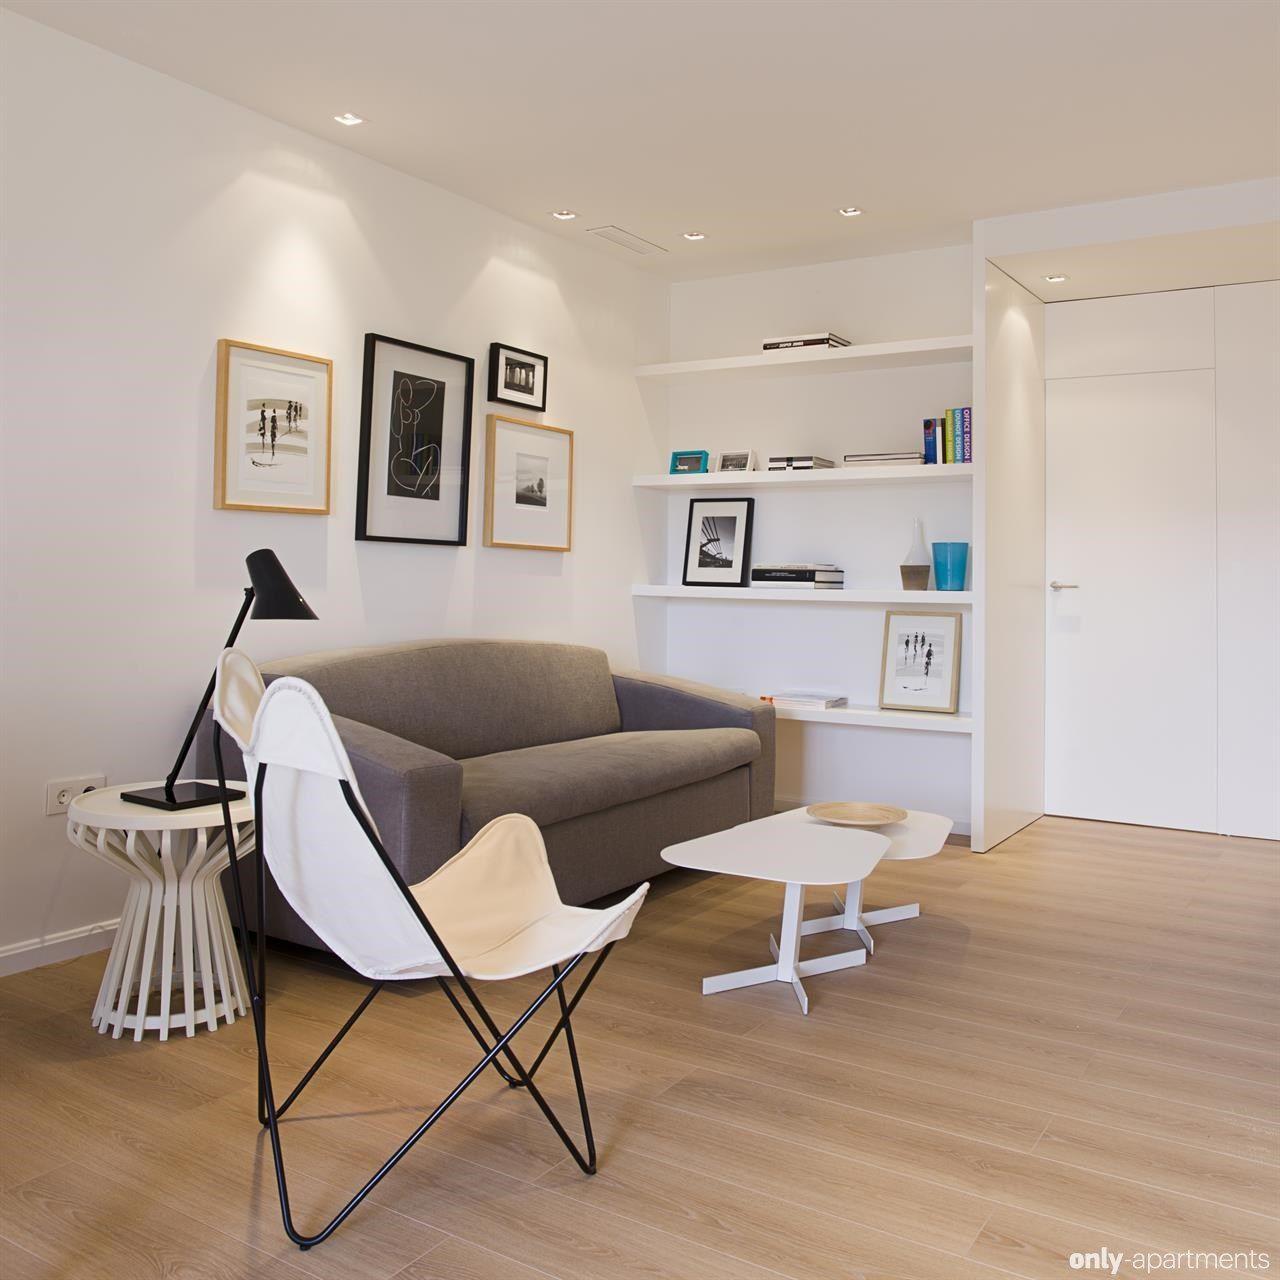 Modern Interior Design Laminate Use. White interior with light wooden floor